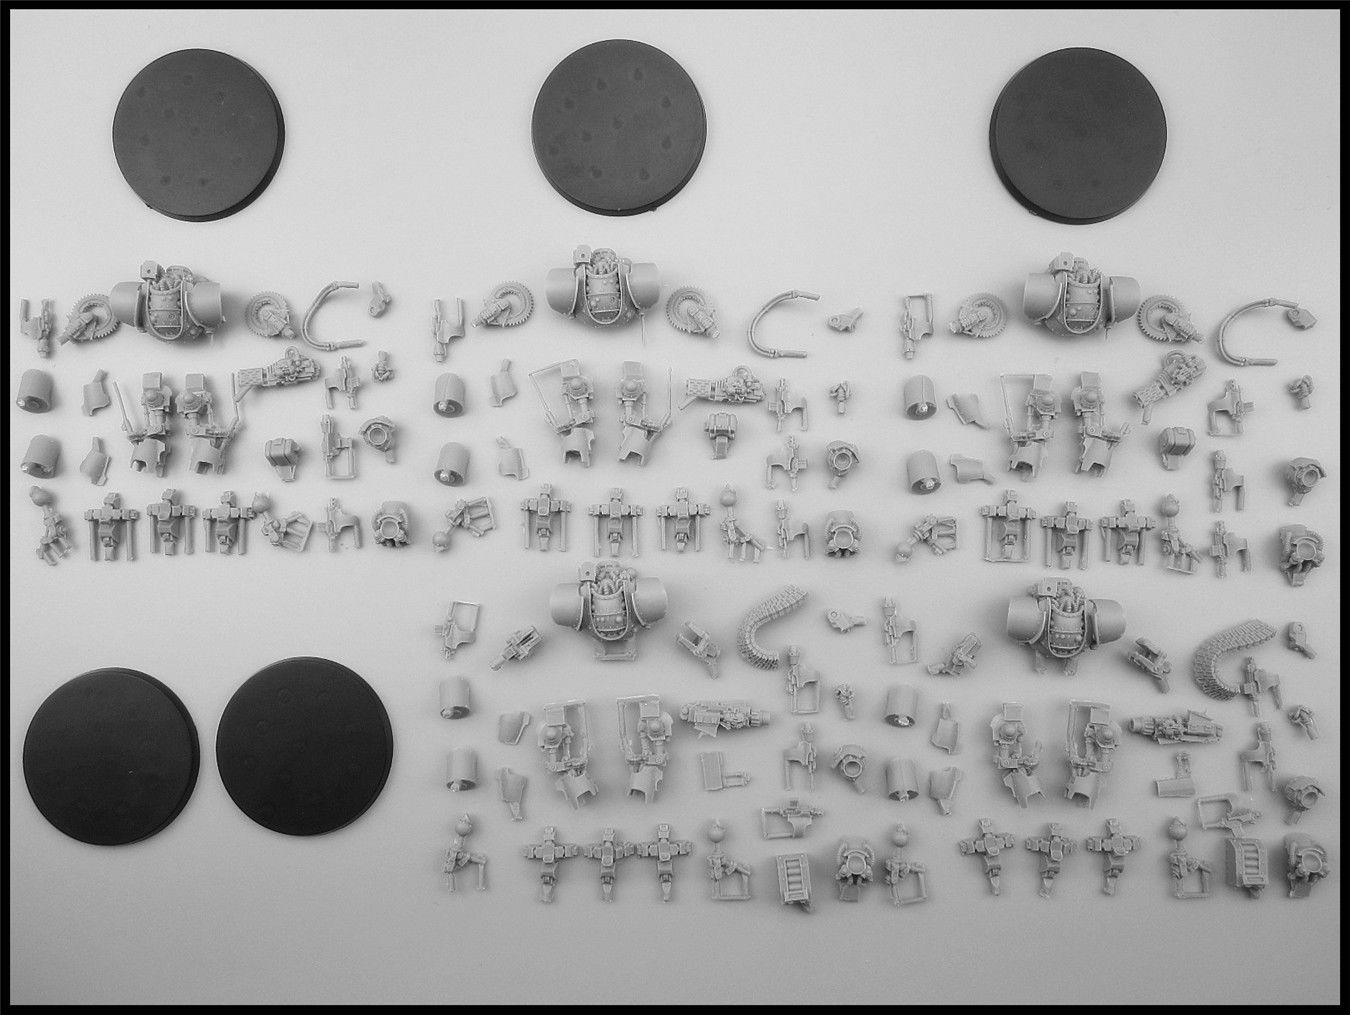 CASTELLAX BATTLE-AUTOMATA MANIPLE 3 classical cellular automata